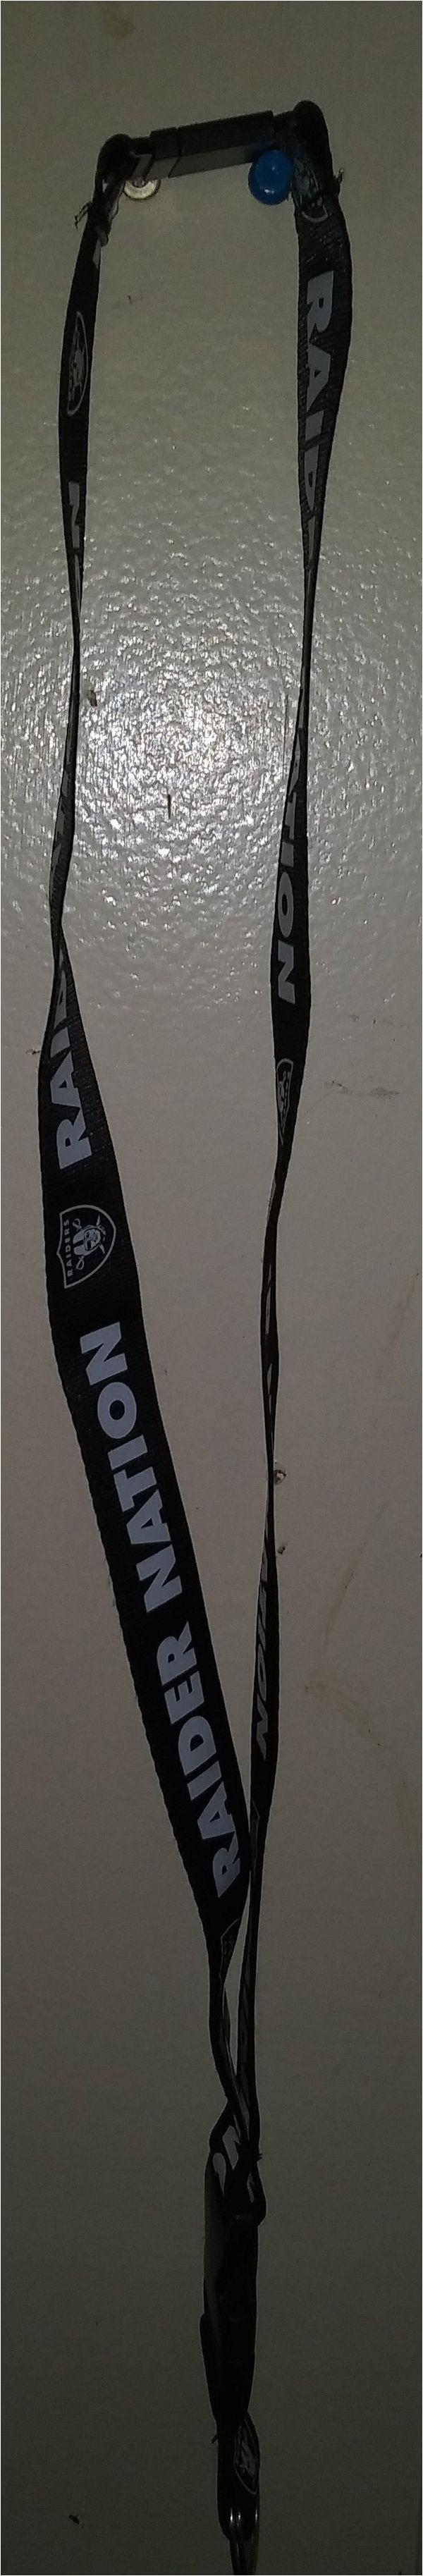 mens nike air huarache run ultra se white black size 11 1 2 for sale in bakersfield ca offerup